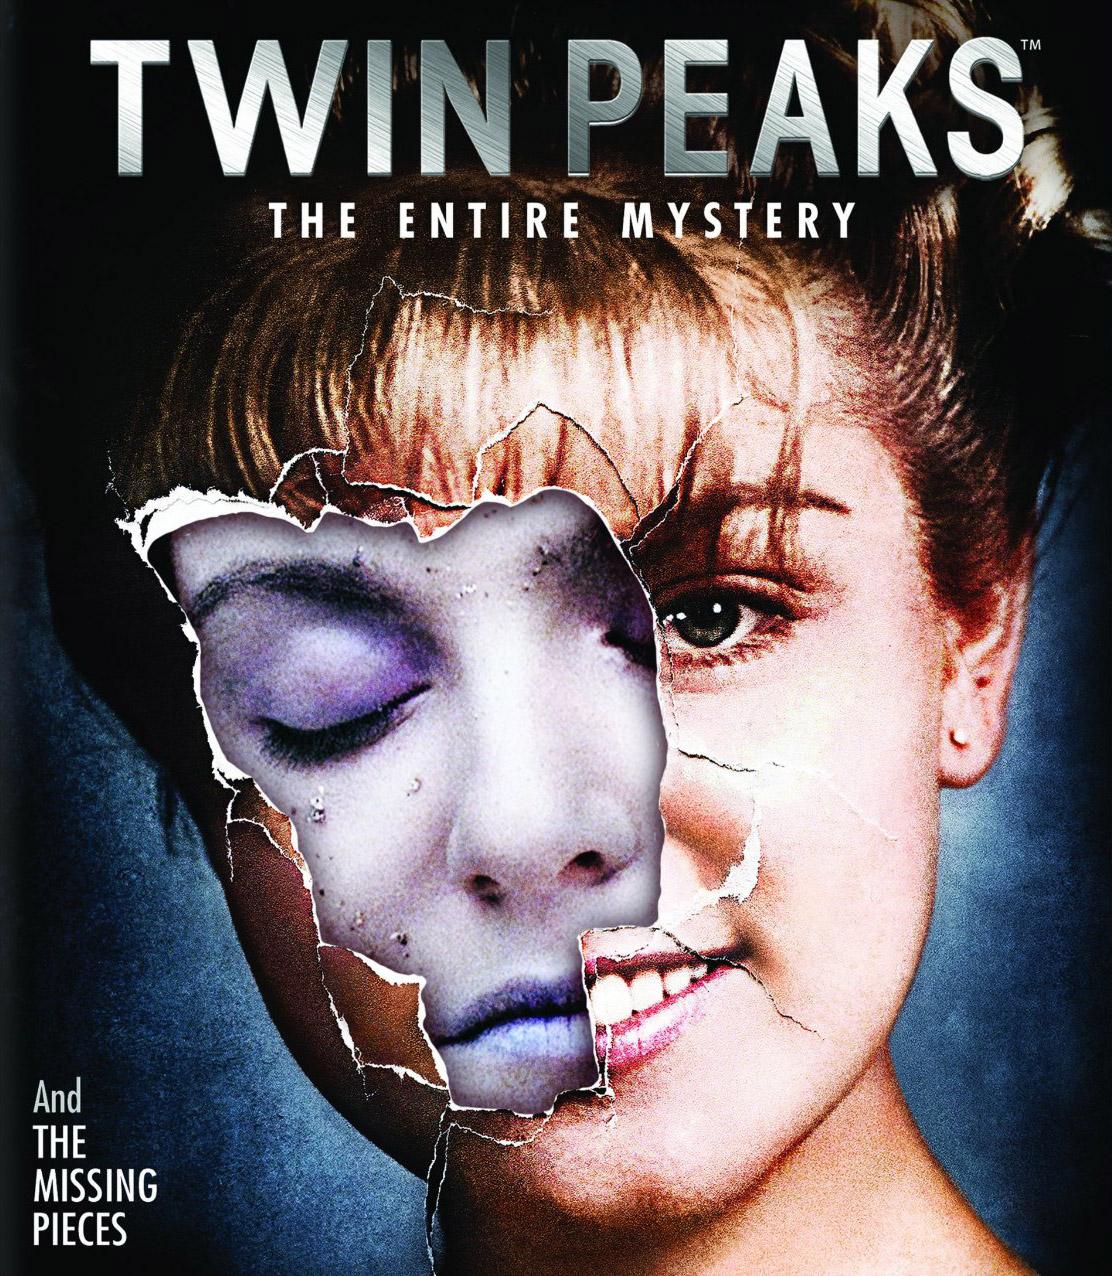 affiche du film Twin Peaks: The Missing Pieces